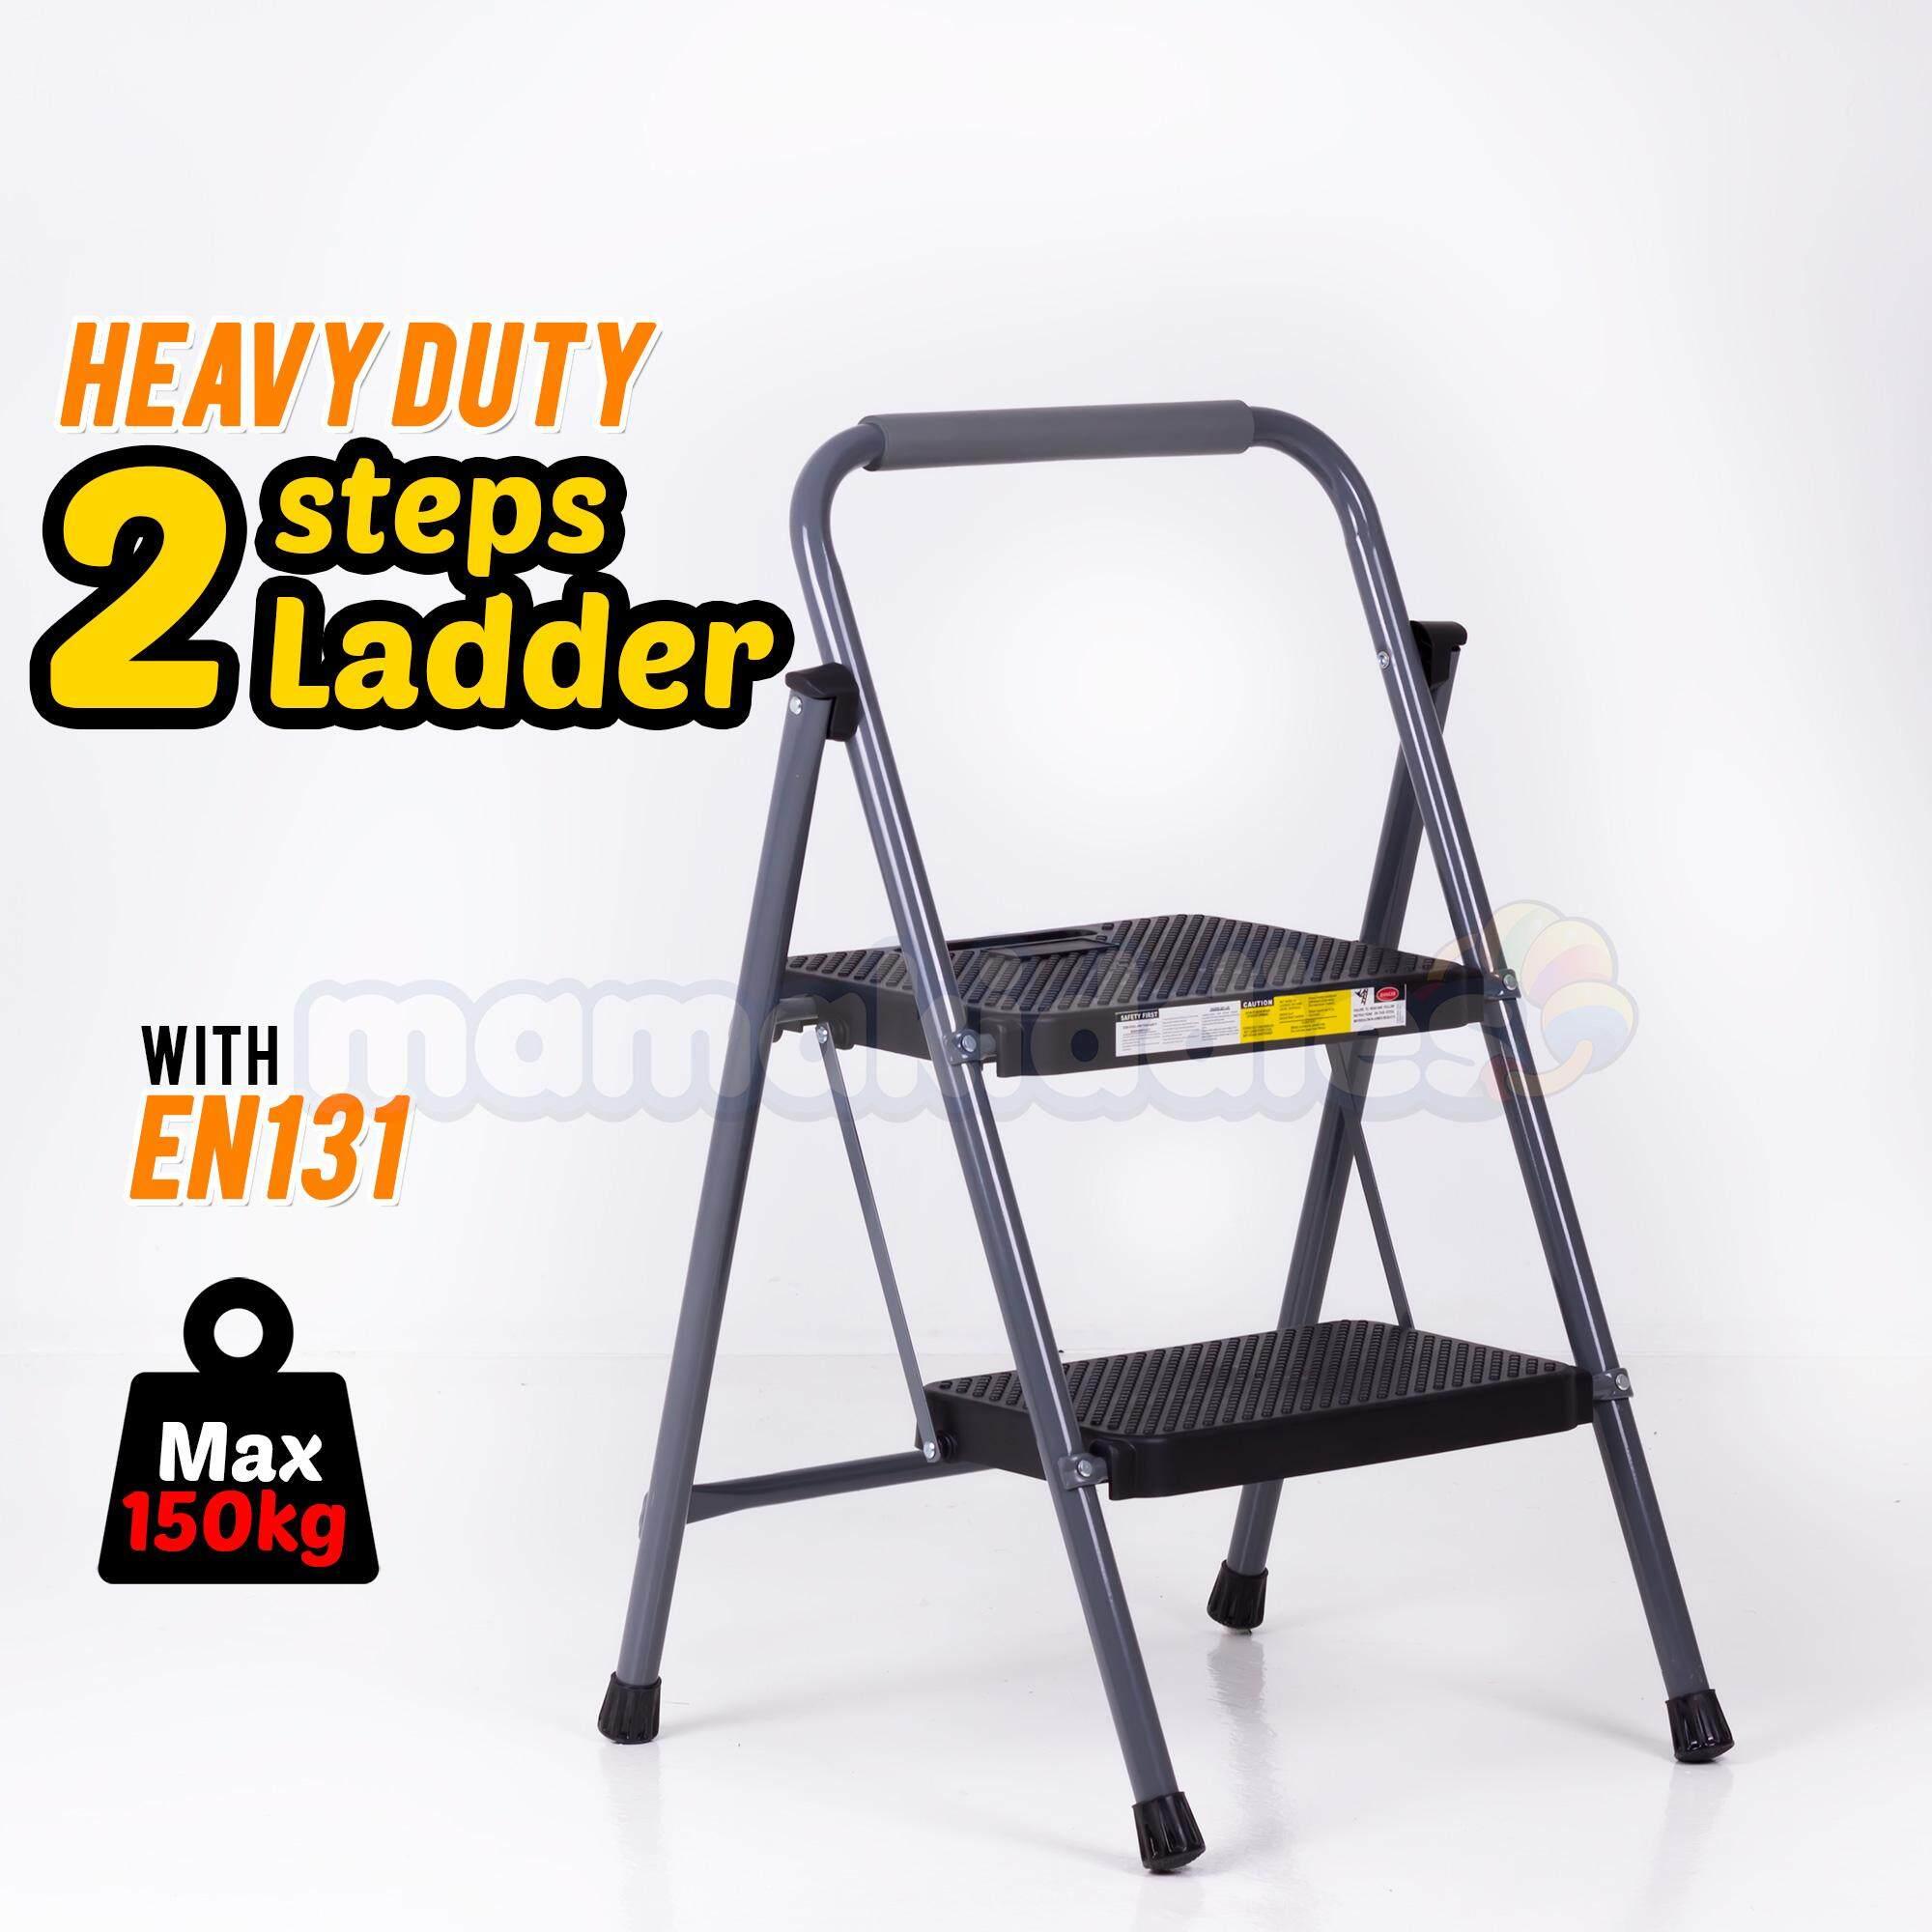 *Ready Stock* Heavy Duty Foldable 2 Step Steel Multipurpose Family Use Household Ladder Tangga EN131 Approve